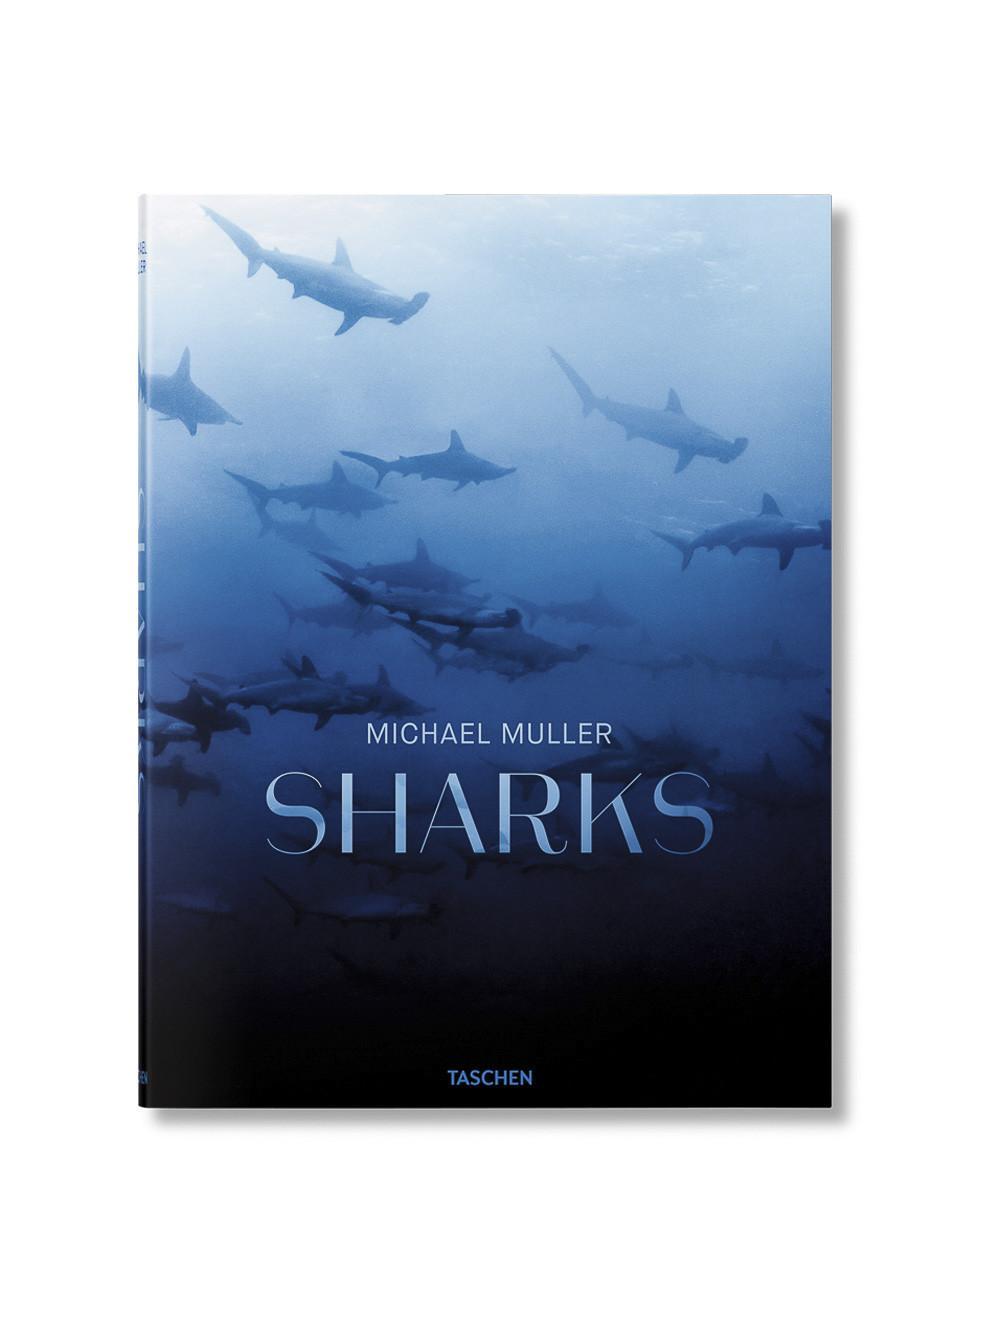 Taschen Sharks. Face-to-face With The Ocean's Endangered Predator